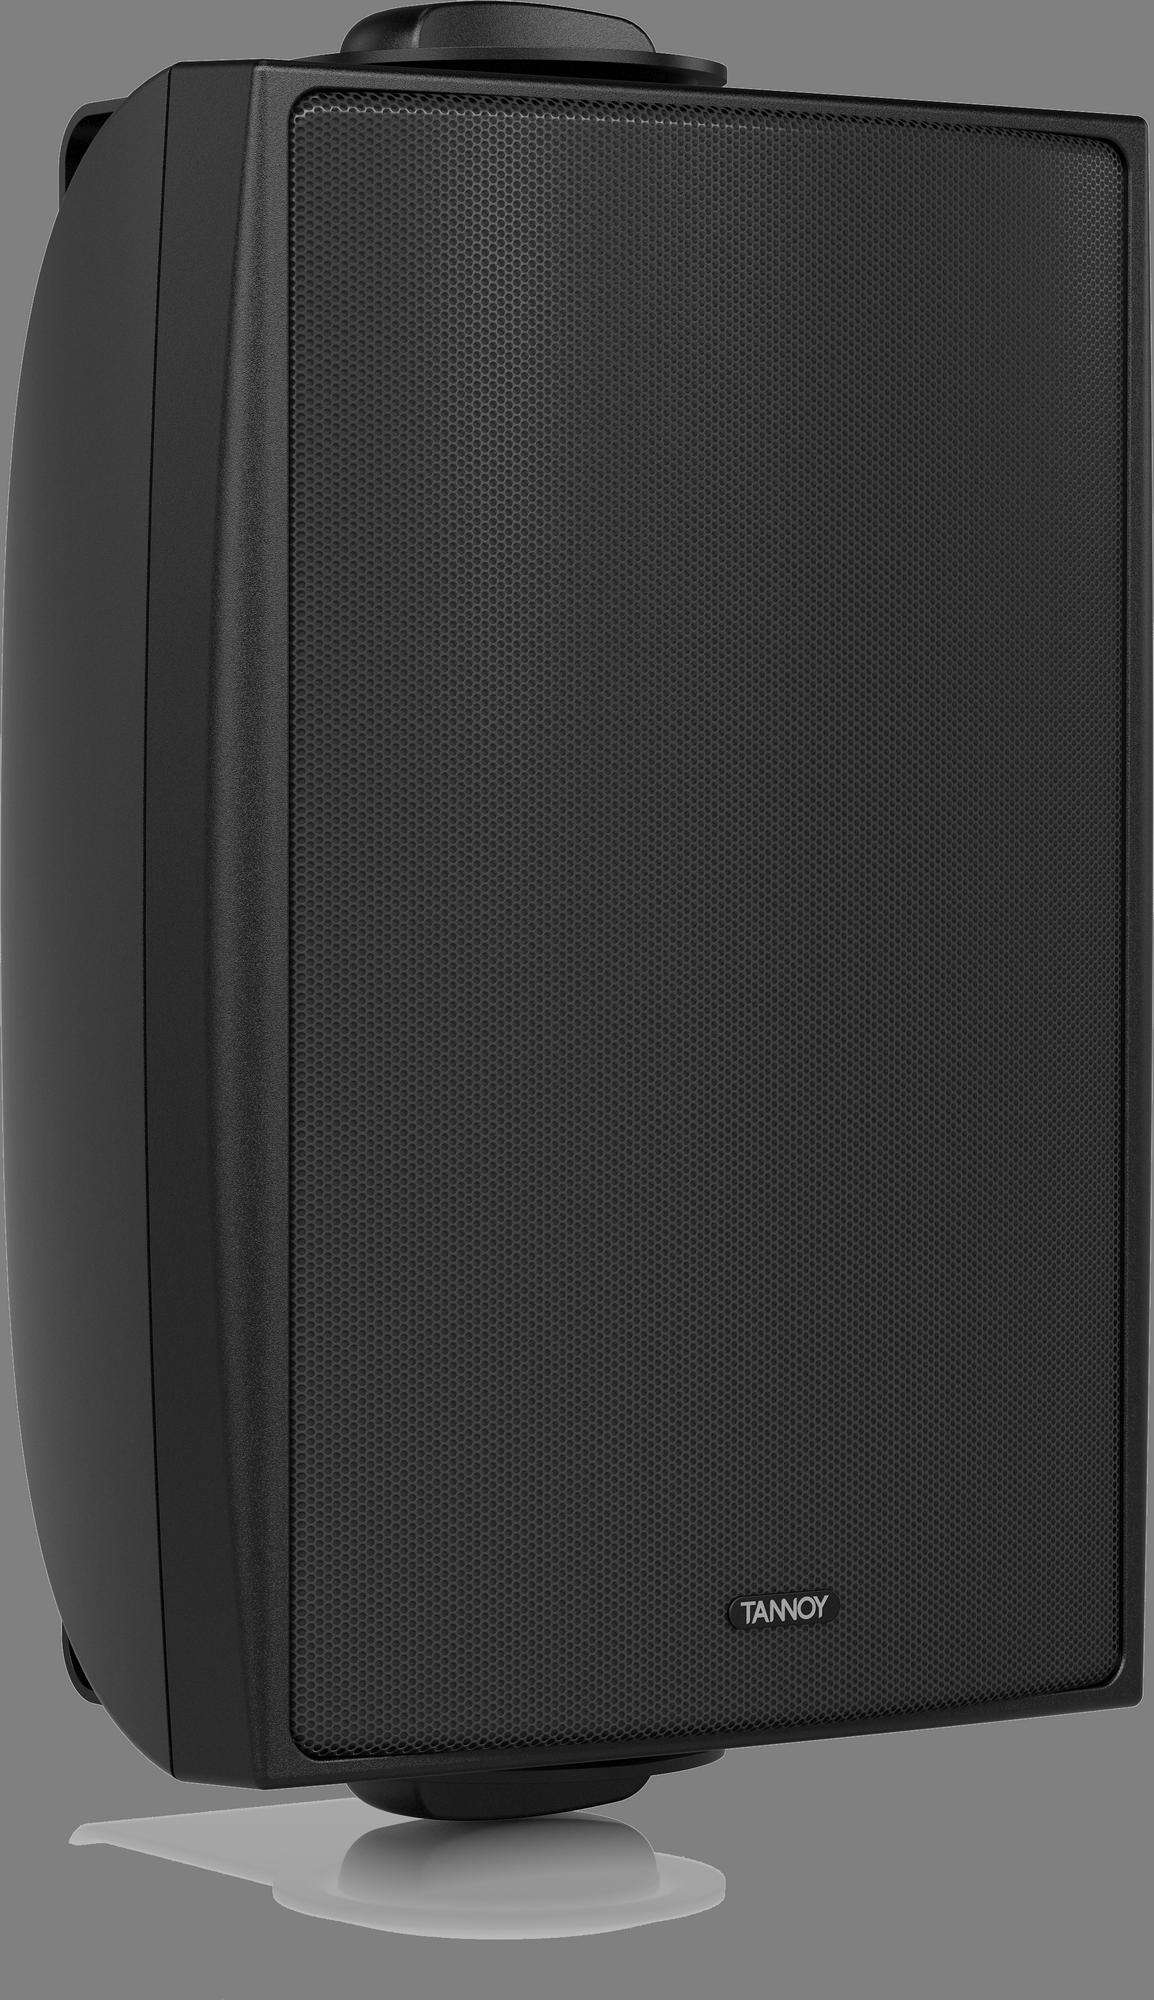 Tannoy  DVS 4t - Loudspeaker